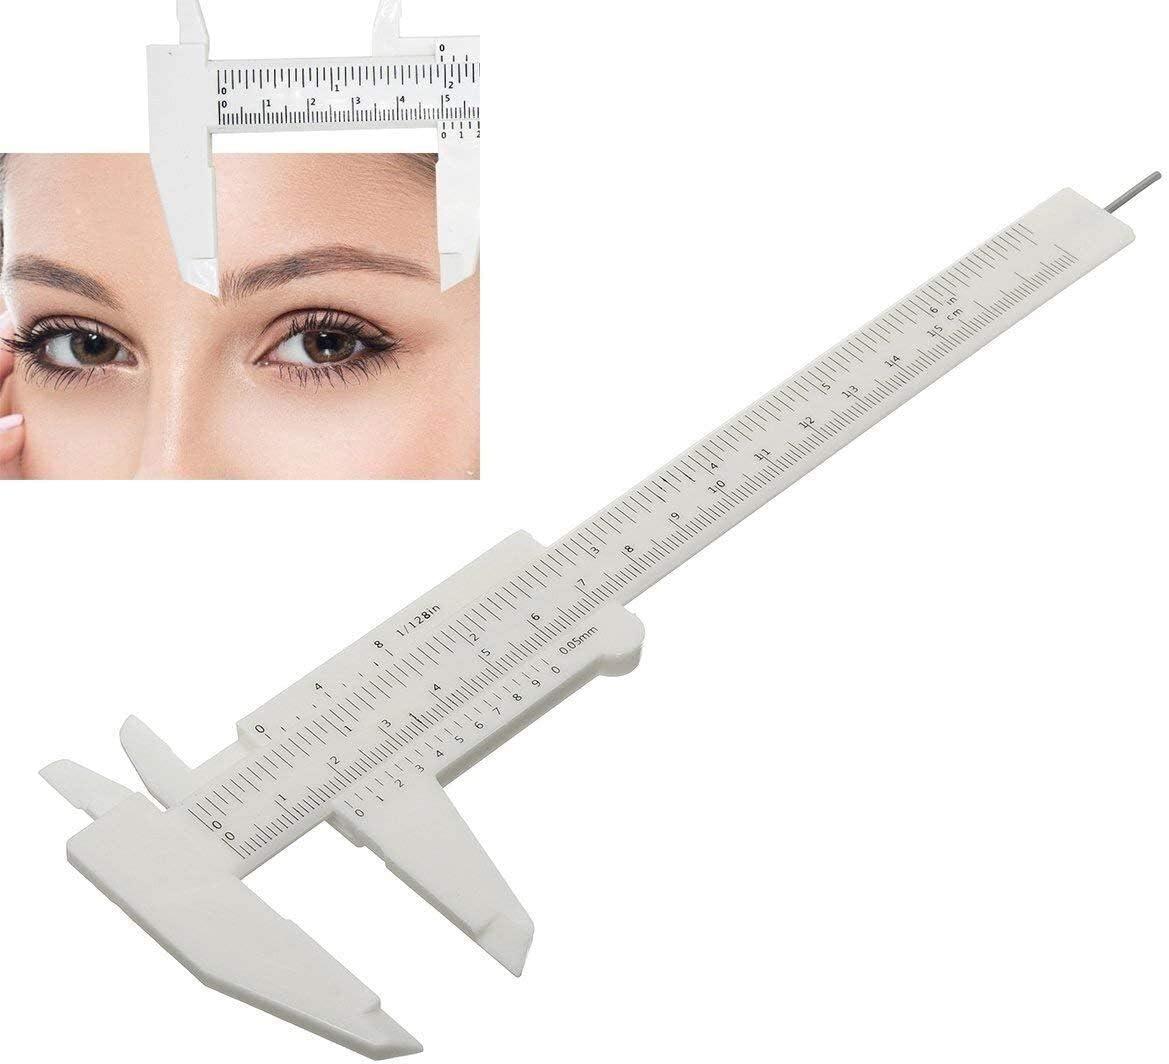 caliper Measuring Max 70% OFF Tools 6 Pcs Eyebrow Discount mail order Sliding Ga Ruler